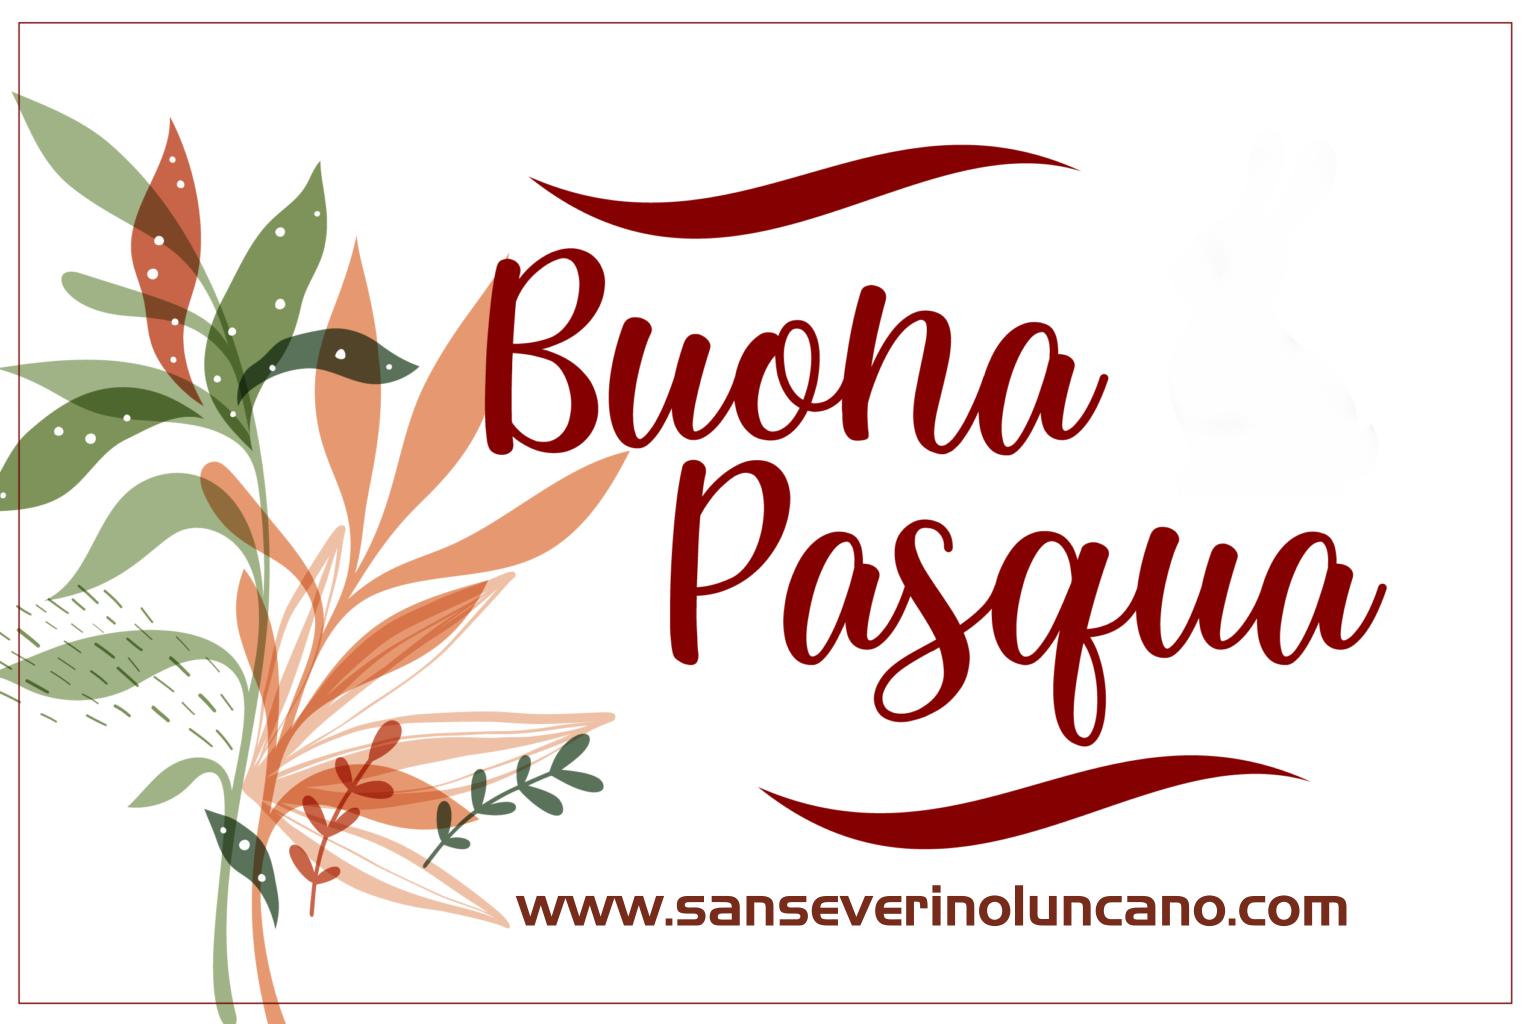 buona pasqua 2021 sanseverinolucano.com